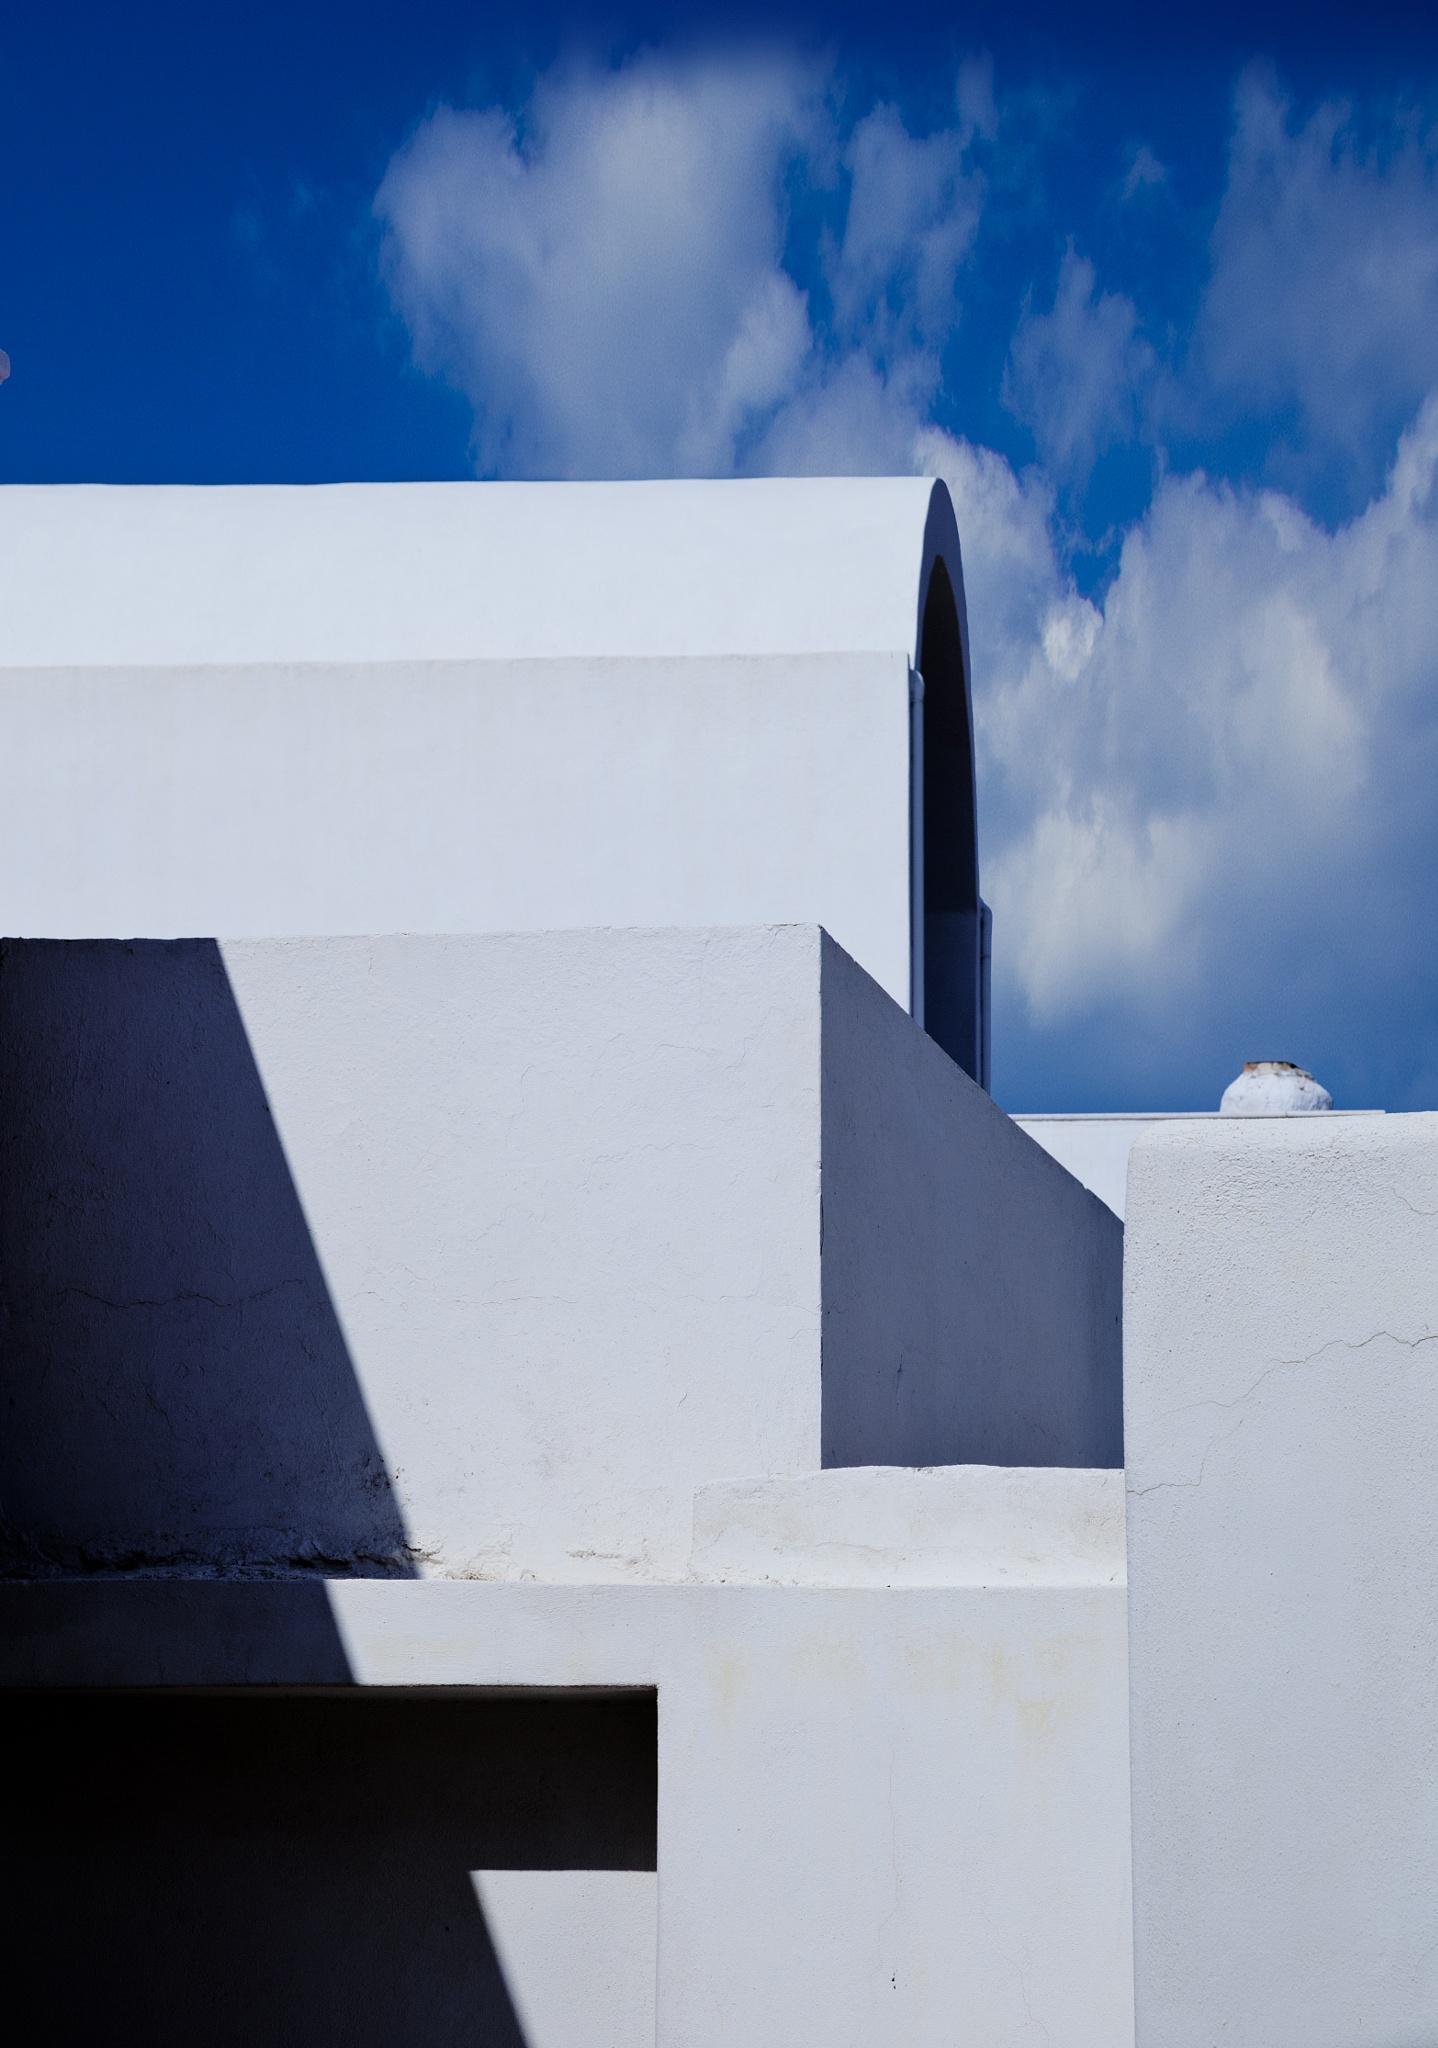 Santorini by Leroy